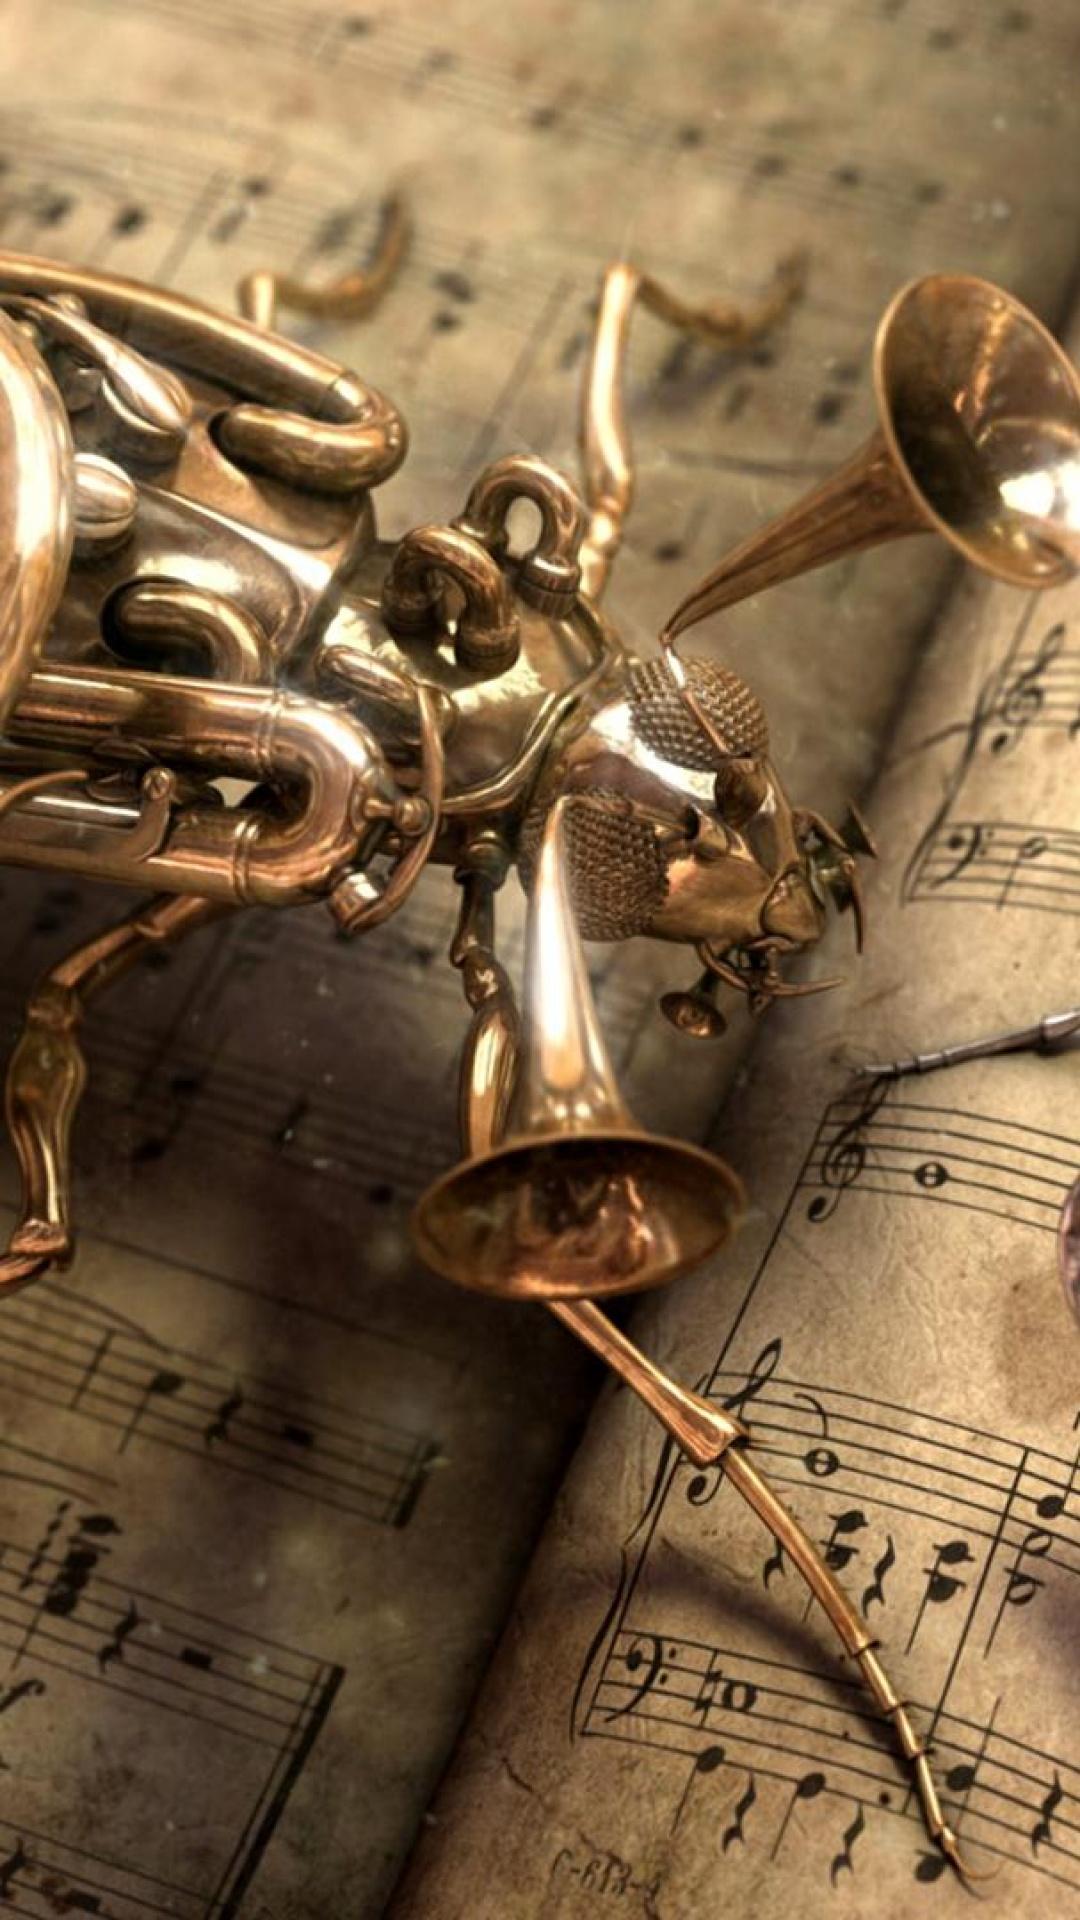 Musical Bug Steampunk iPhone 6 Plus HD Wallpaper 1080x1920